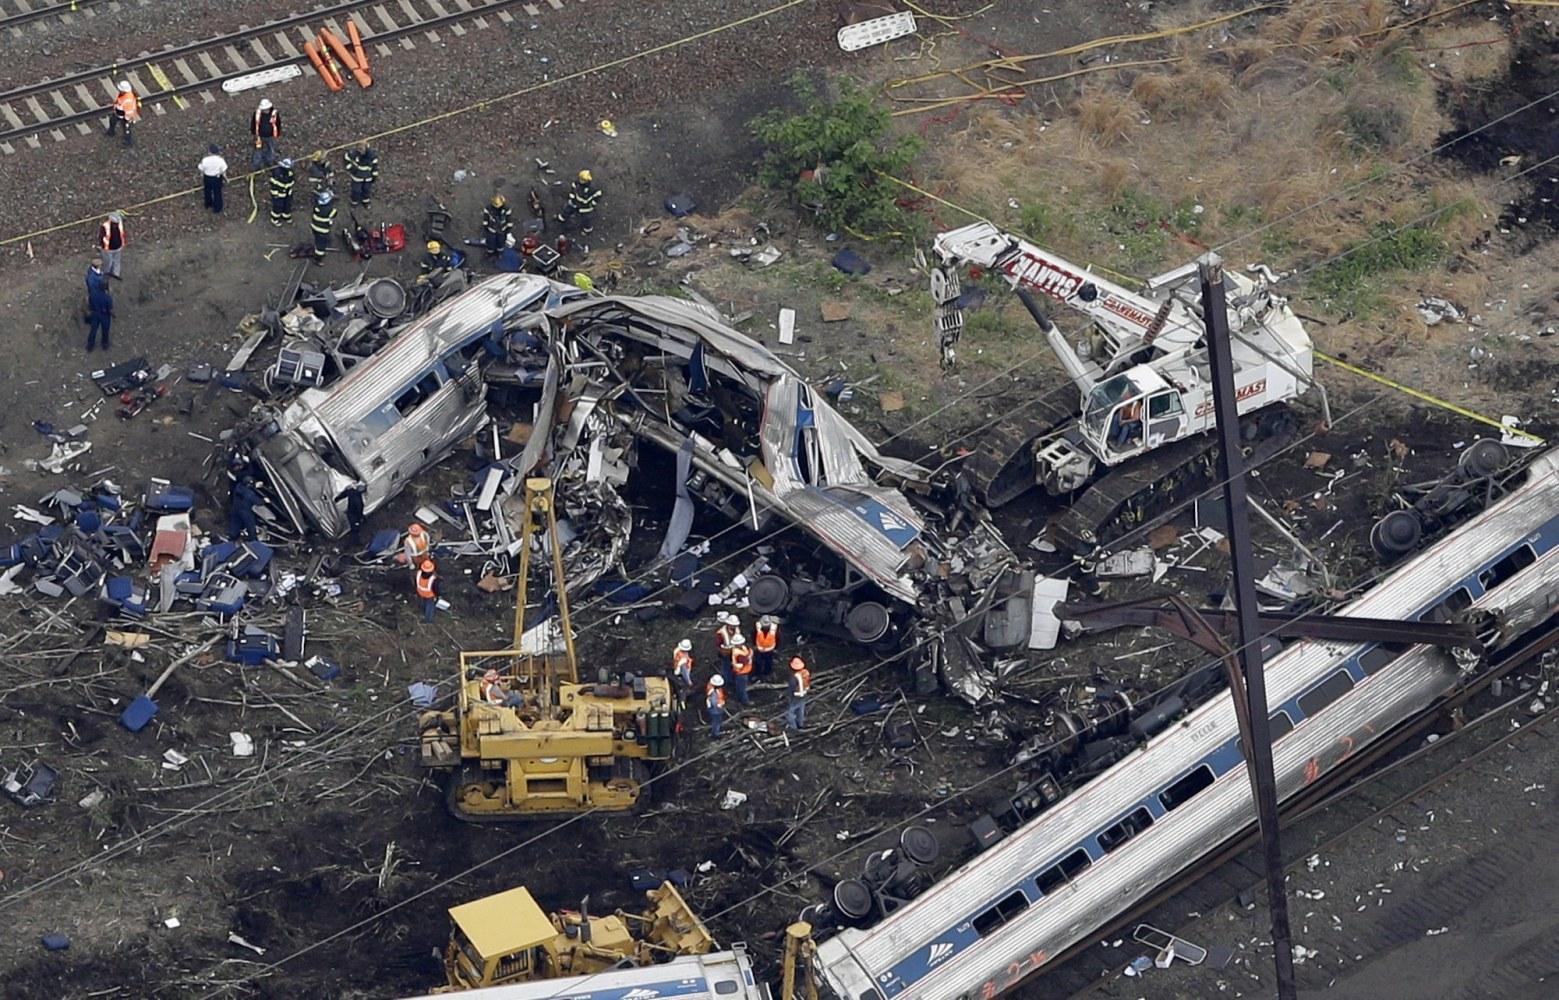 Human Error And High Speed Blamed For Deadly Philadelphia